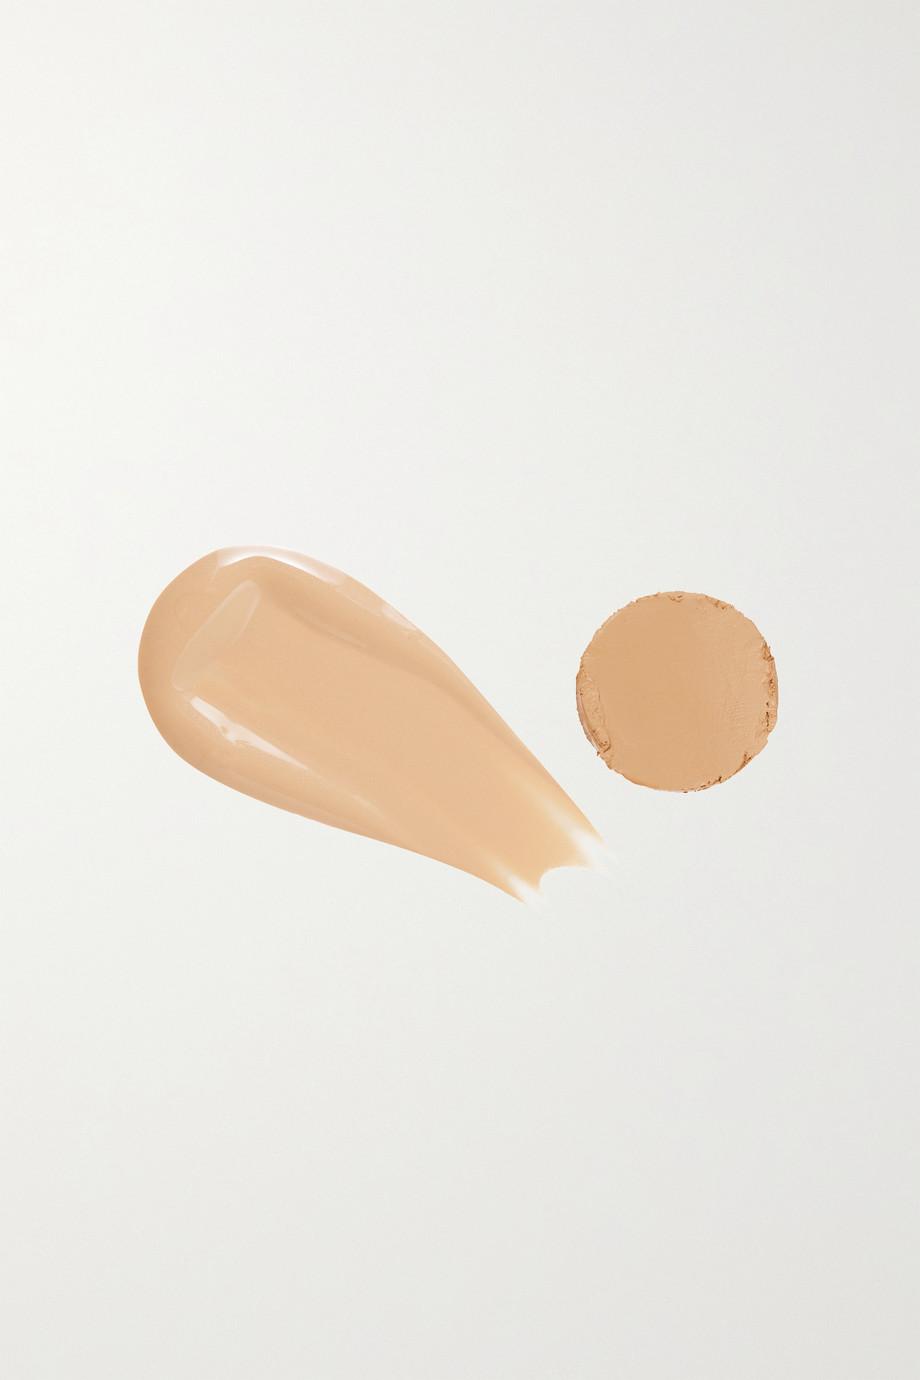 Wander Beauty Dualist Matte and Illuminating Concealer – Tan – Concealer